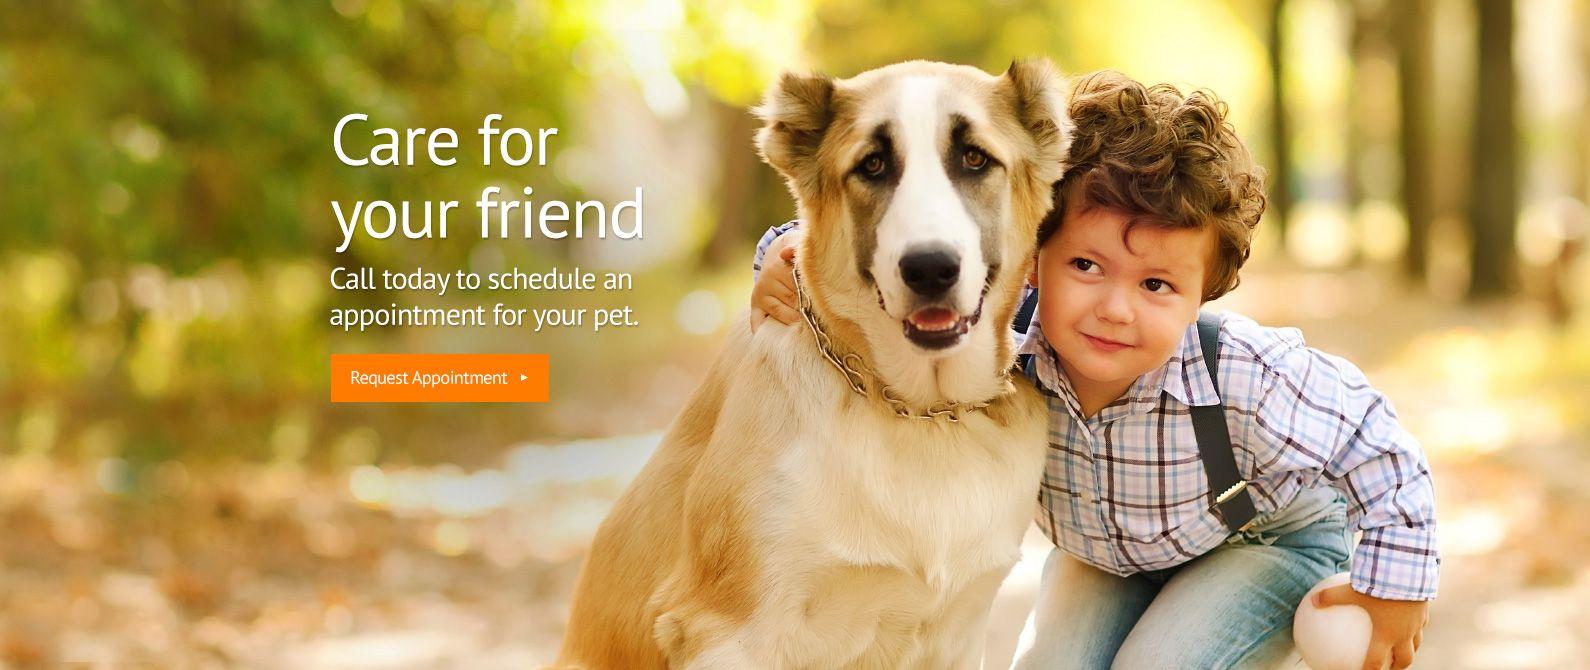 Saugus Animal Hospital Veterinarian In Saugus Ca Usa Home Pet Clinic Animal Hospital Veterinary Hospital